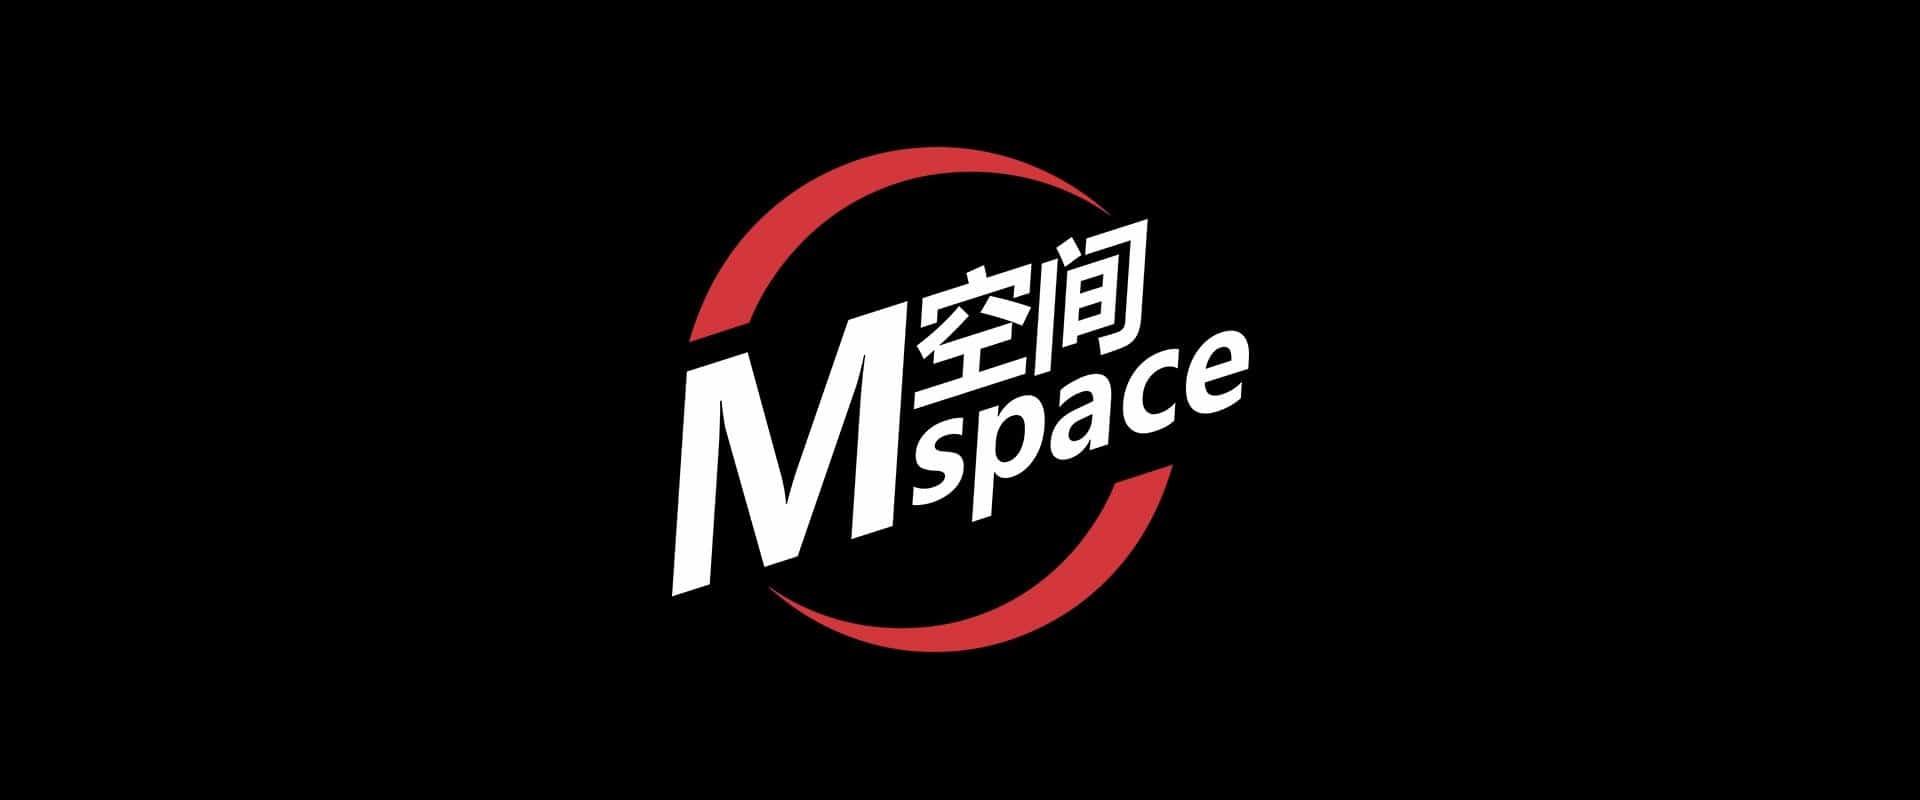 Huaxi M Space Chengdu logo chengdu expat